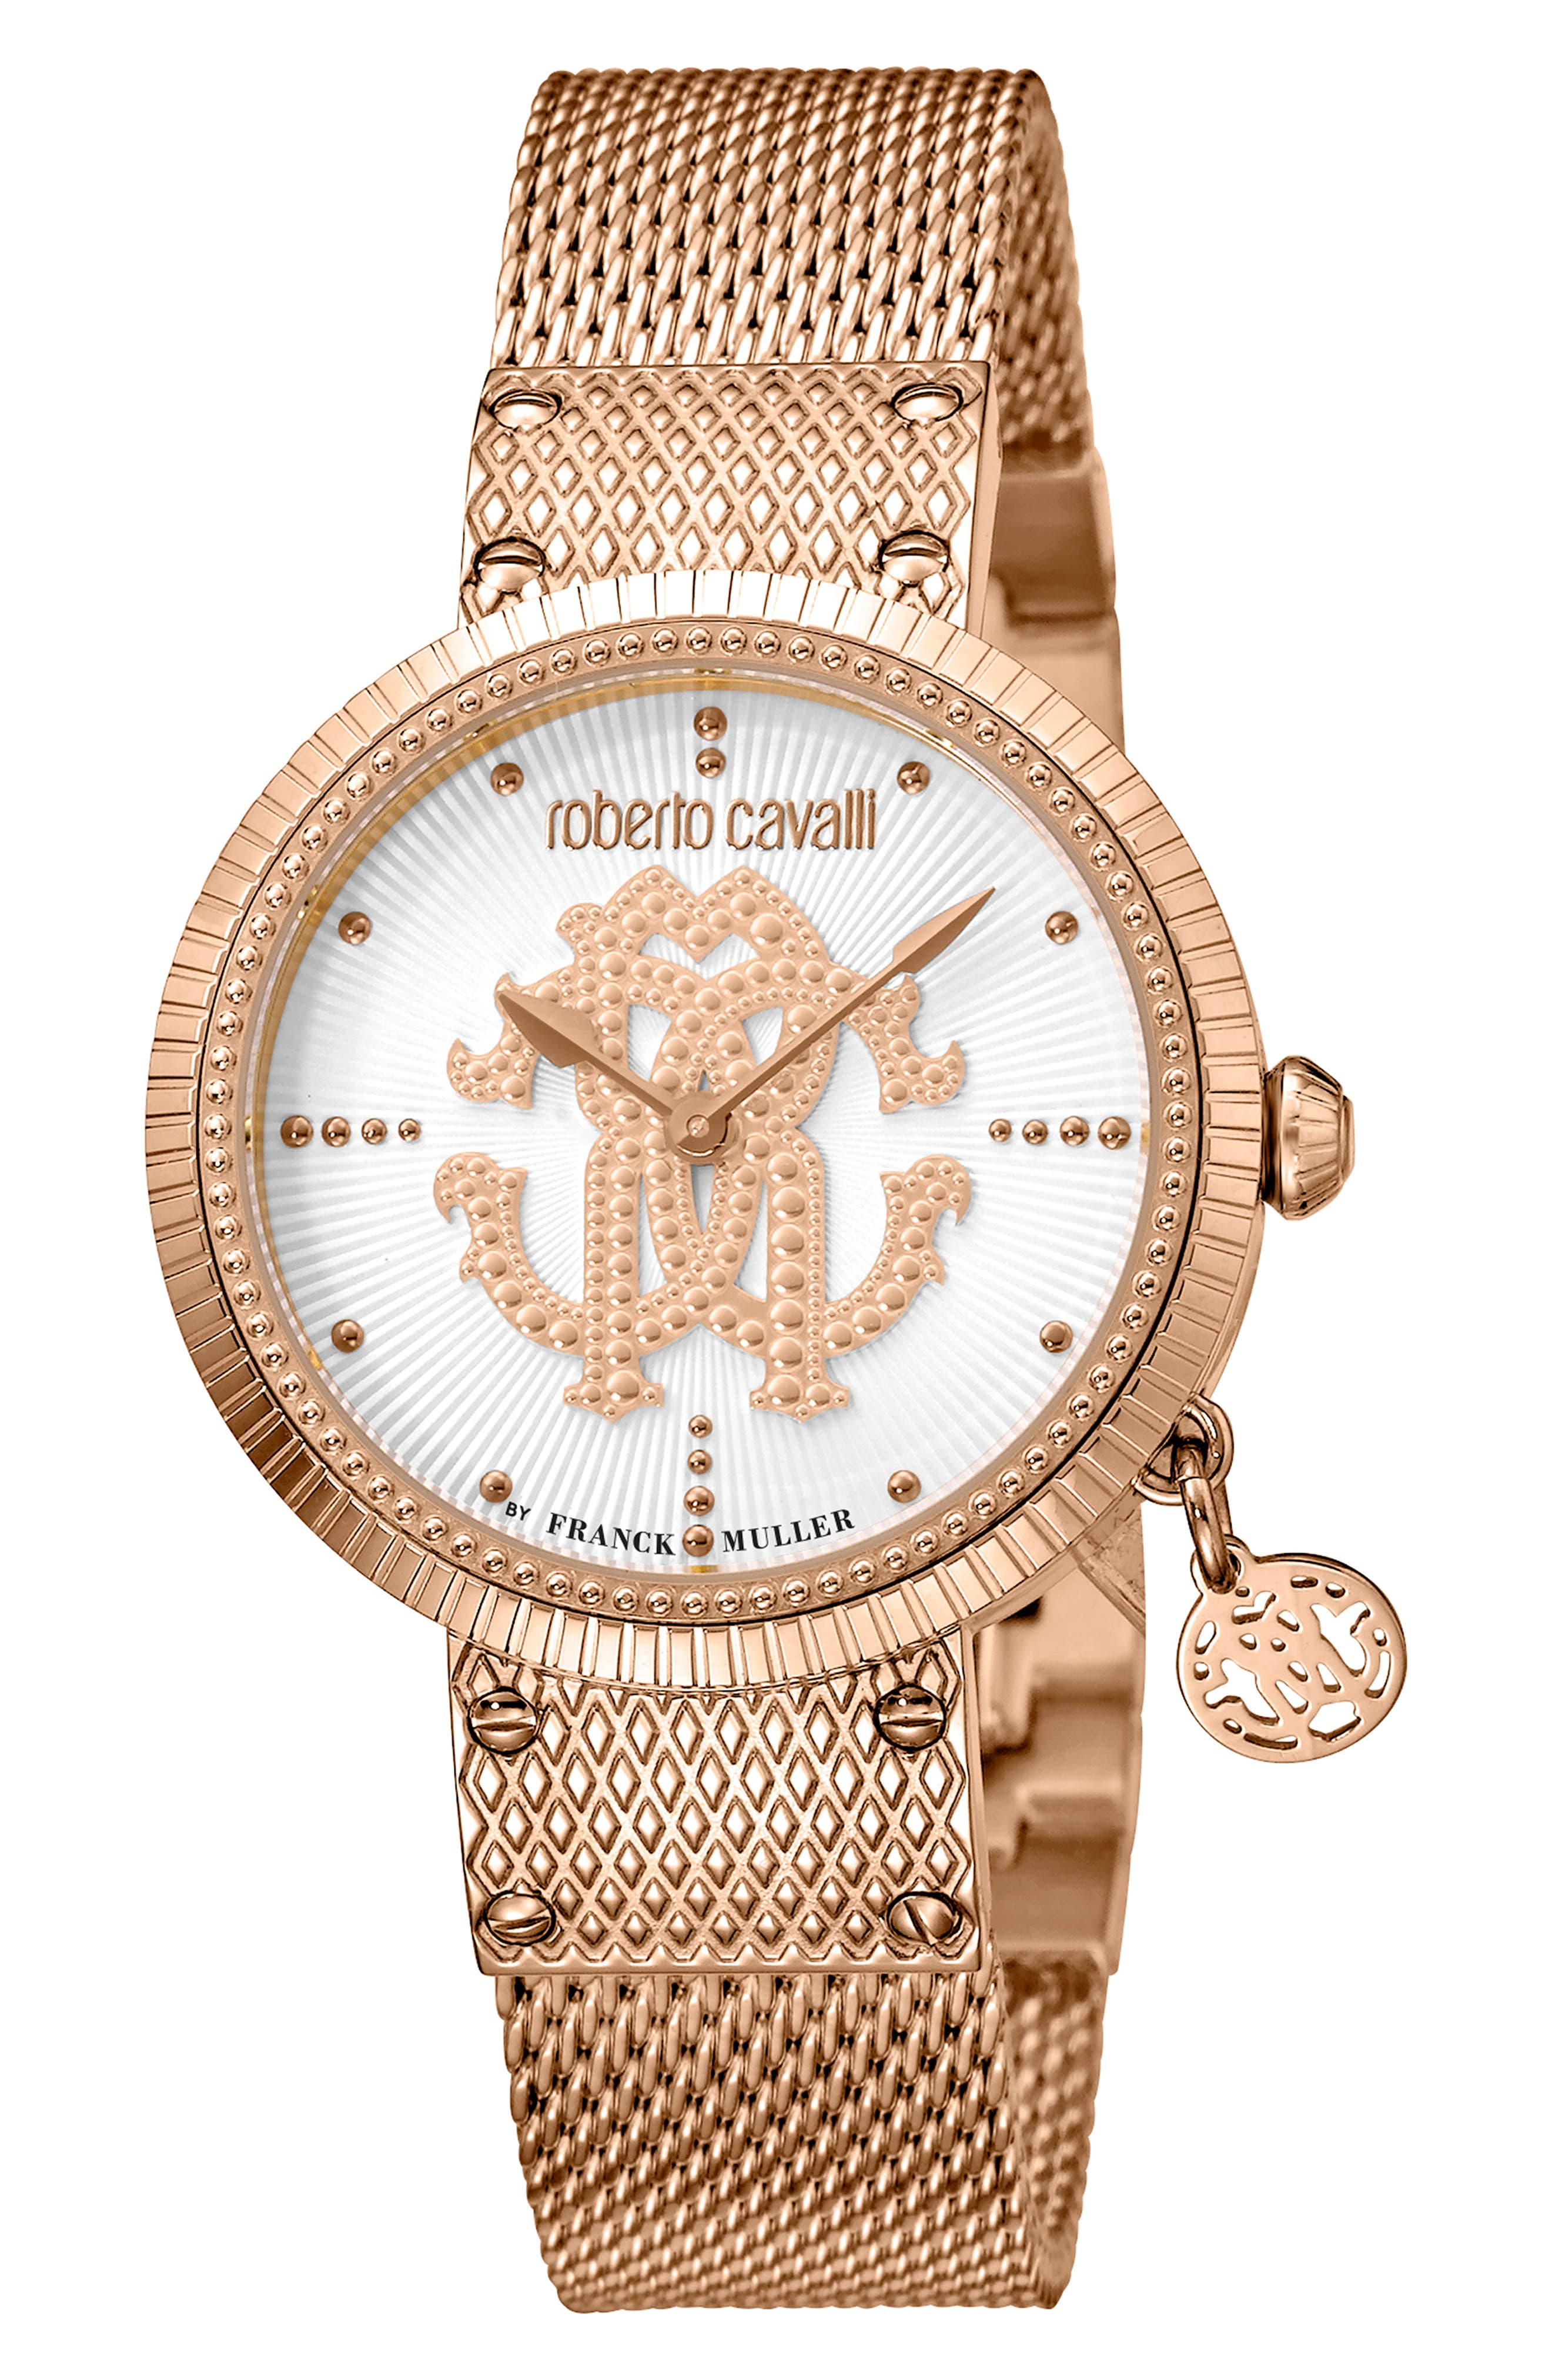 ROBERTO CAVALLI BY FRANCK MULLER Dotted Bracelet Watch, 34Mm in Rose Gold/ Silver/ Rose Gold